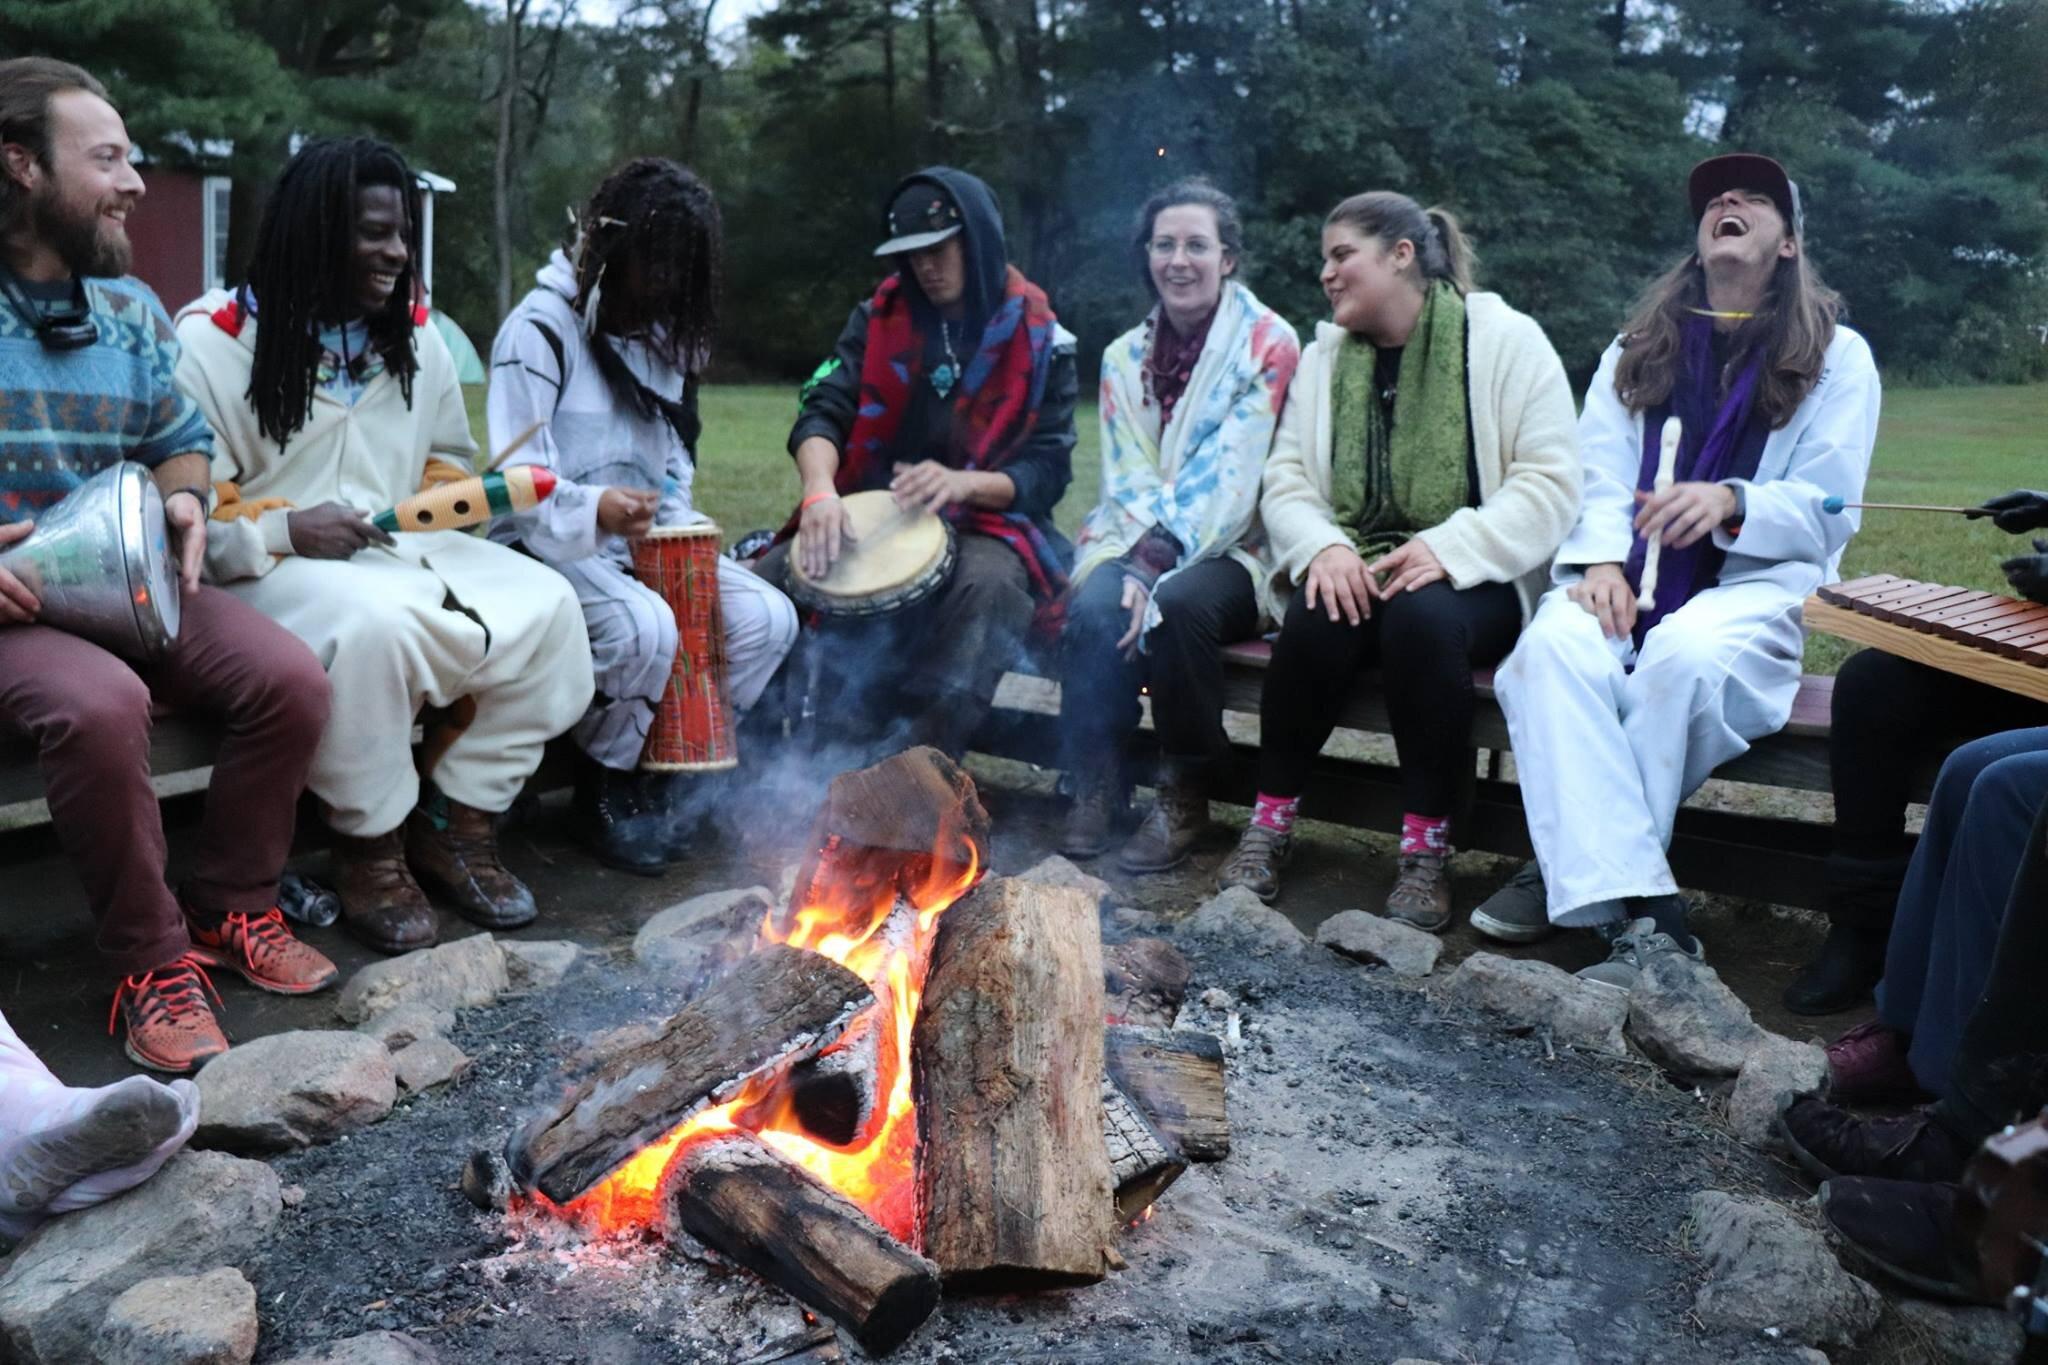 beauty in the backyard 2019 maryland ramblewood retreat sustainability music art food community environment fun camp fire